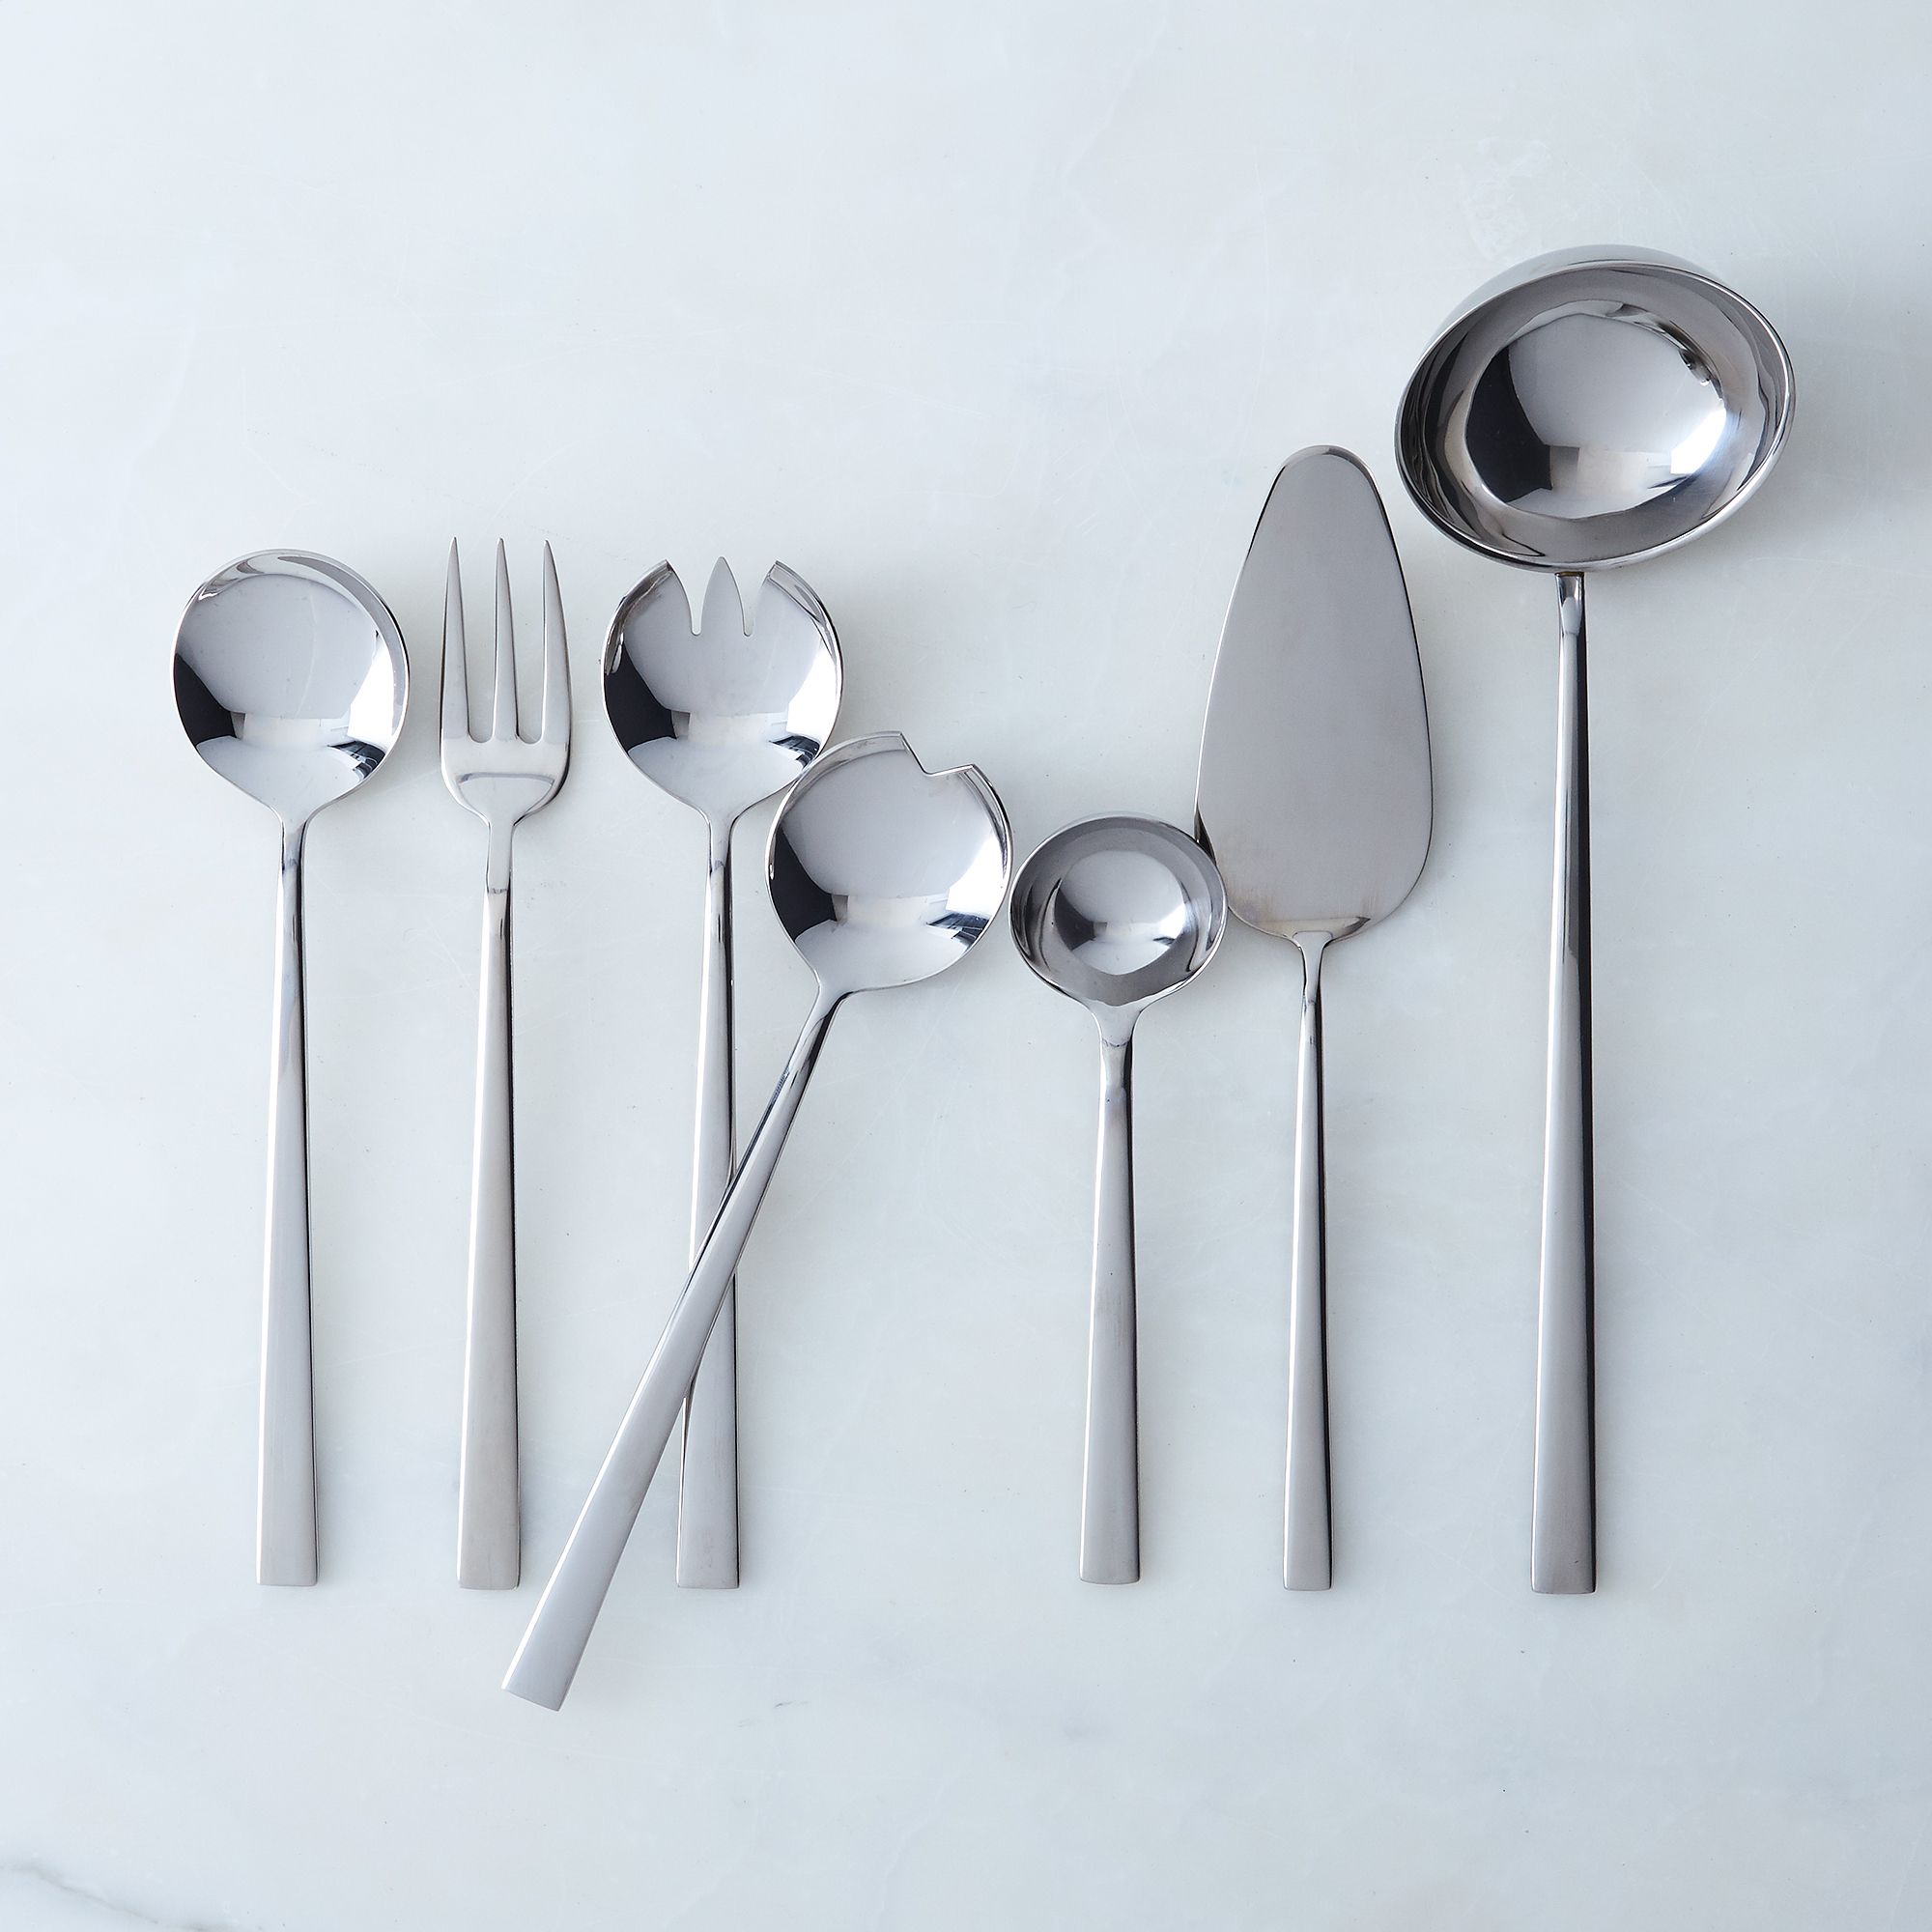 Italian Serveware, Movida (7-Piece Serving Set) on Food52